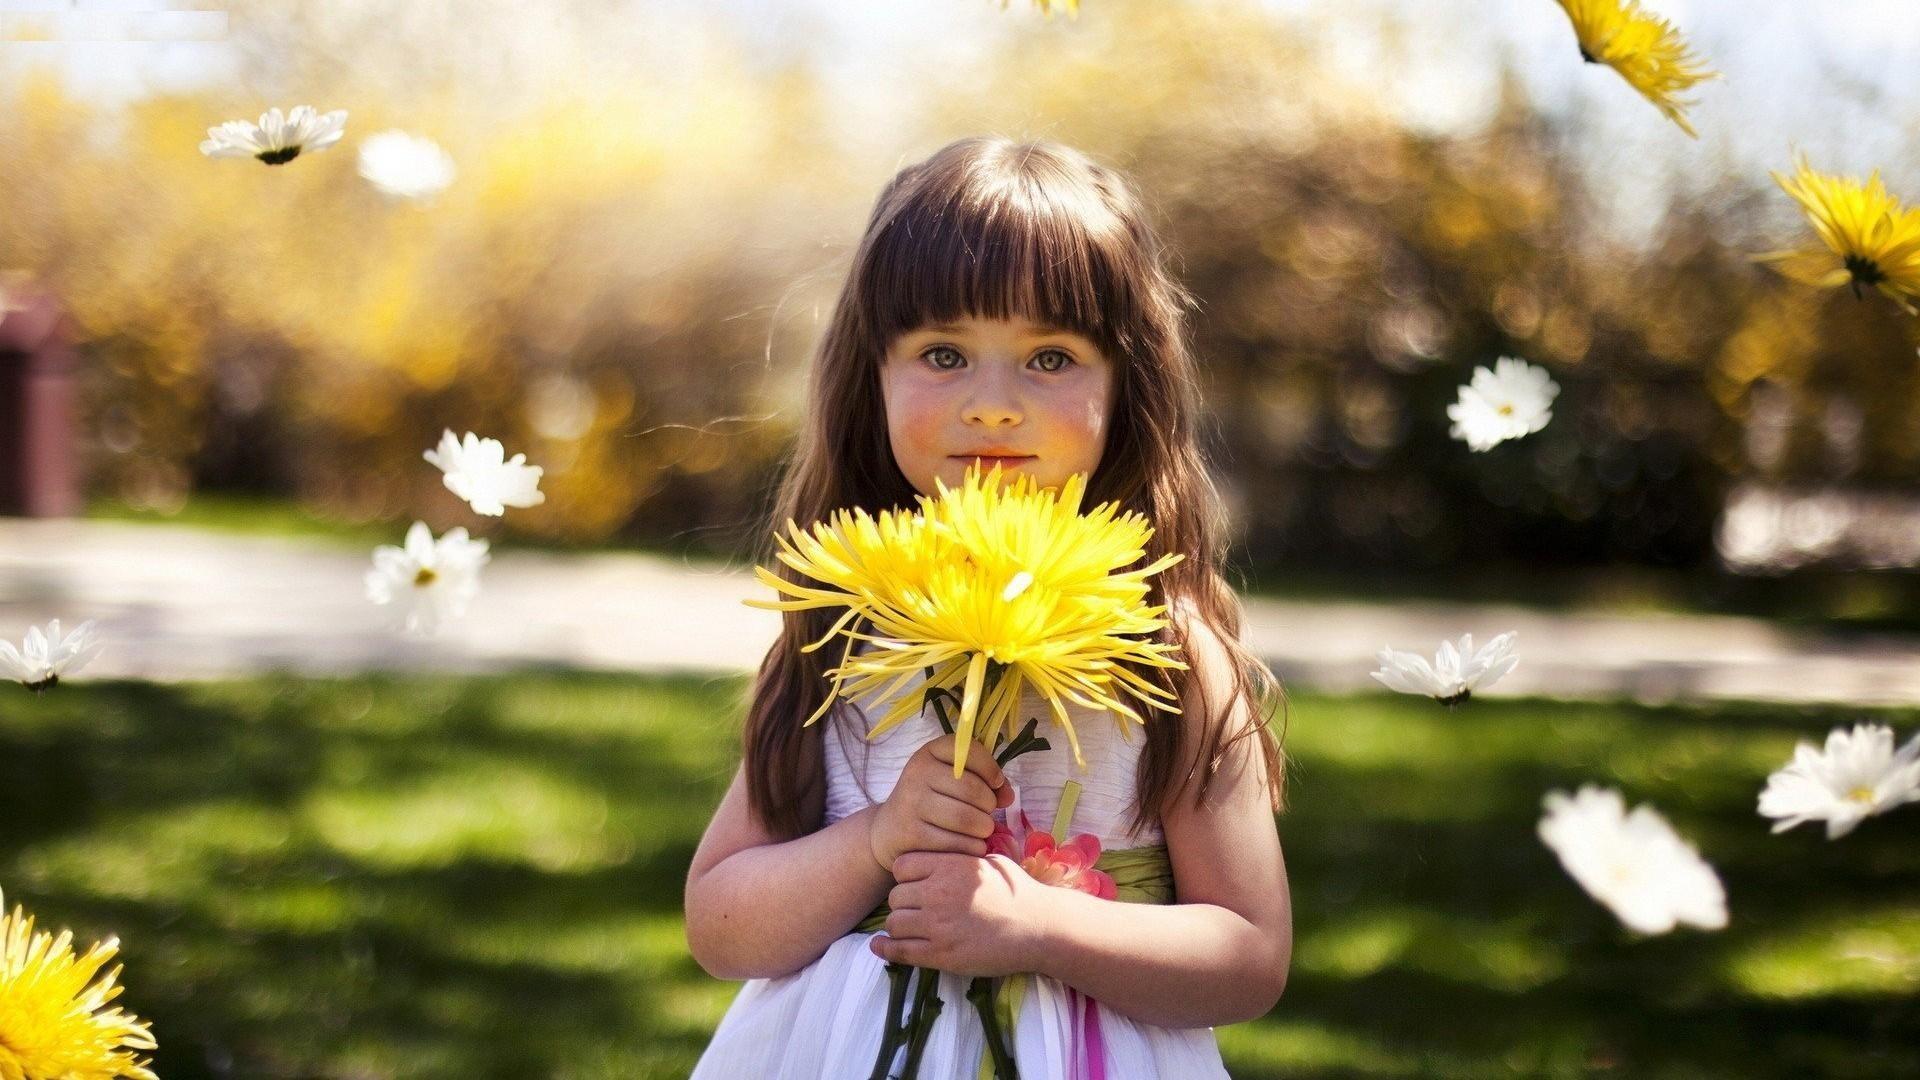 Cute Little Baby Girl Wallpapers Best Cute Images Free Download Pixelstalk Net